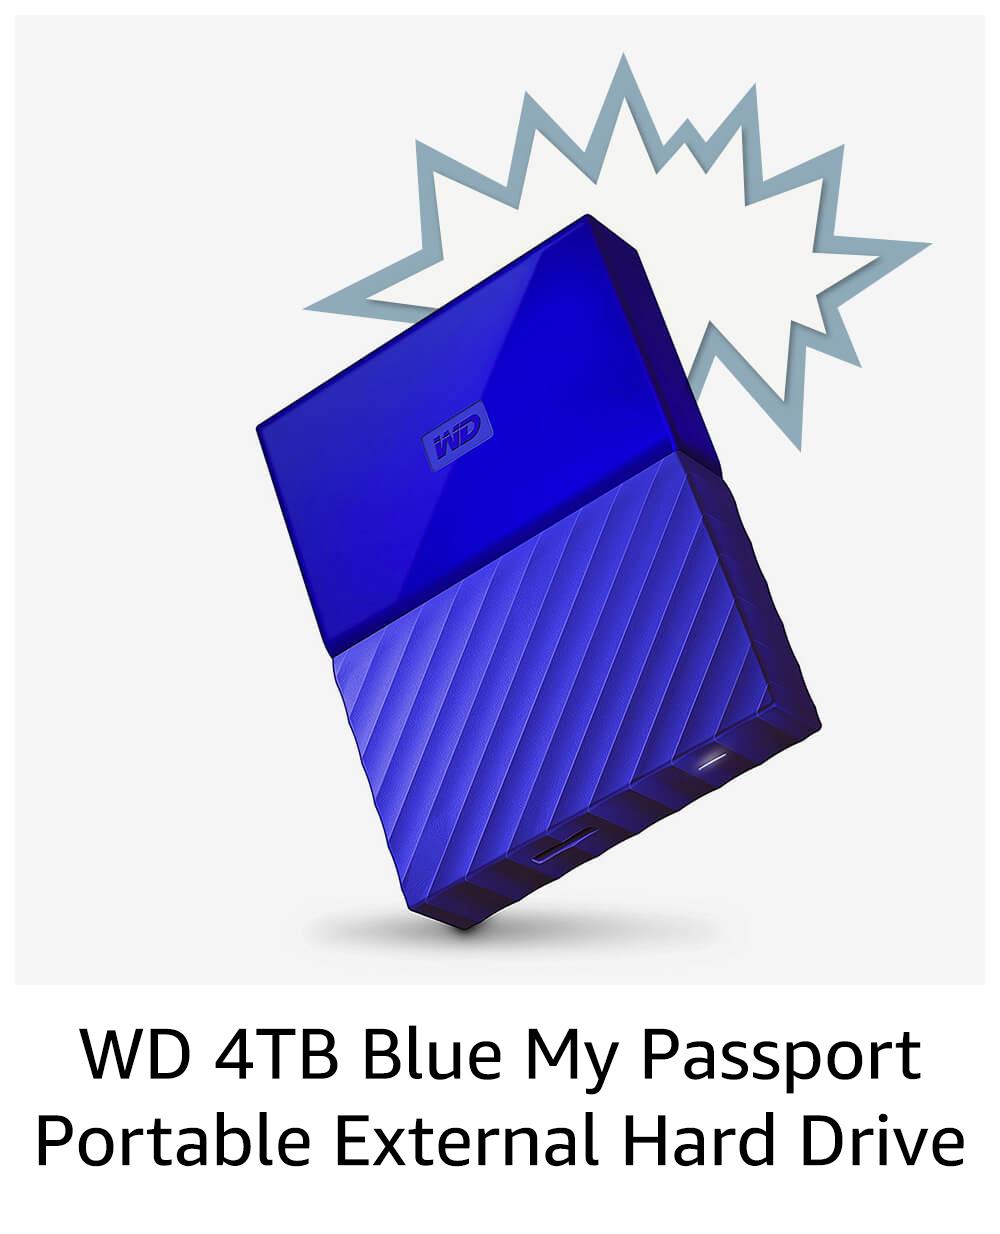 WD 4TB Blue My Passport Portable External Hard Drive